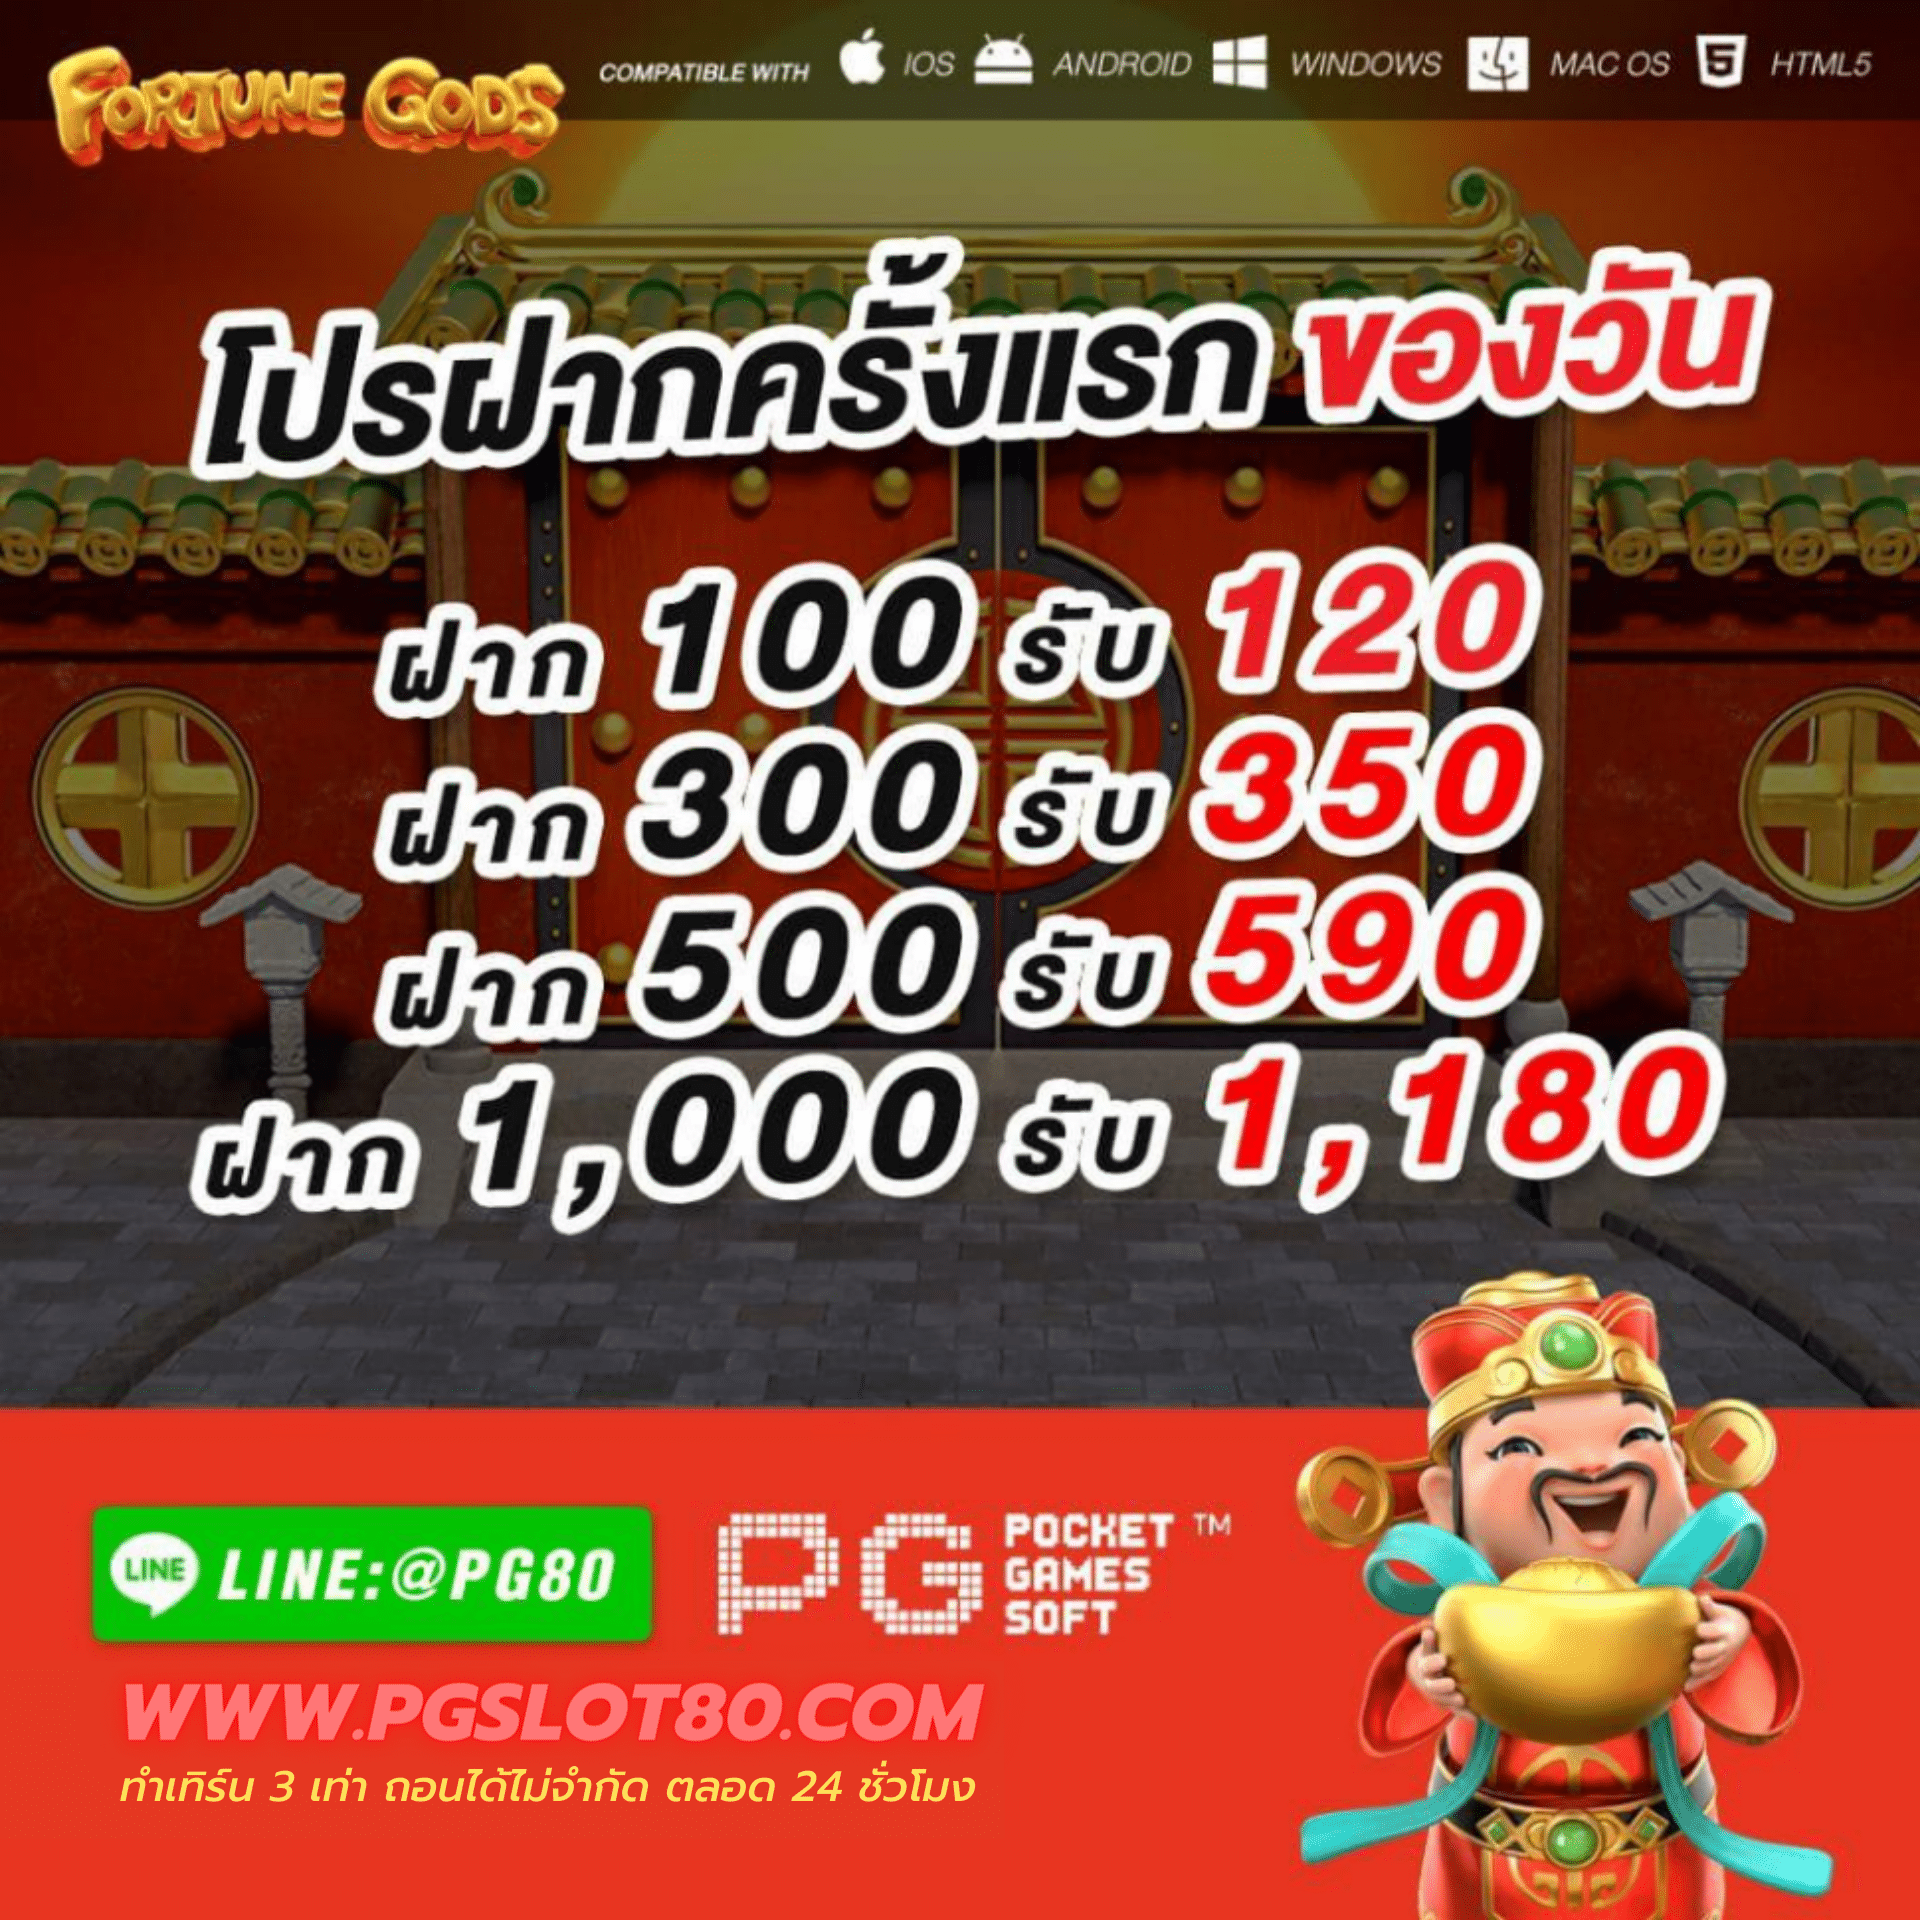 pg slot ฝาก20รับ100